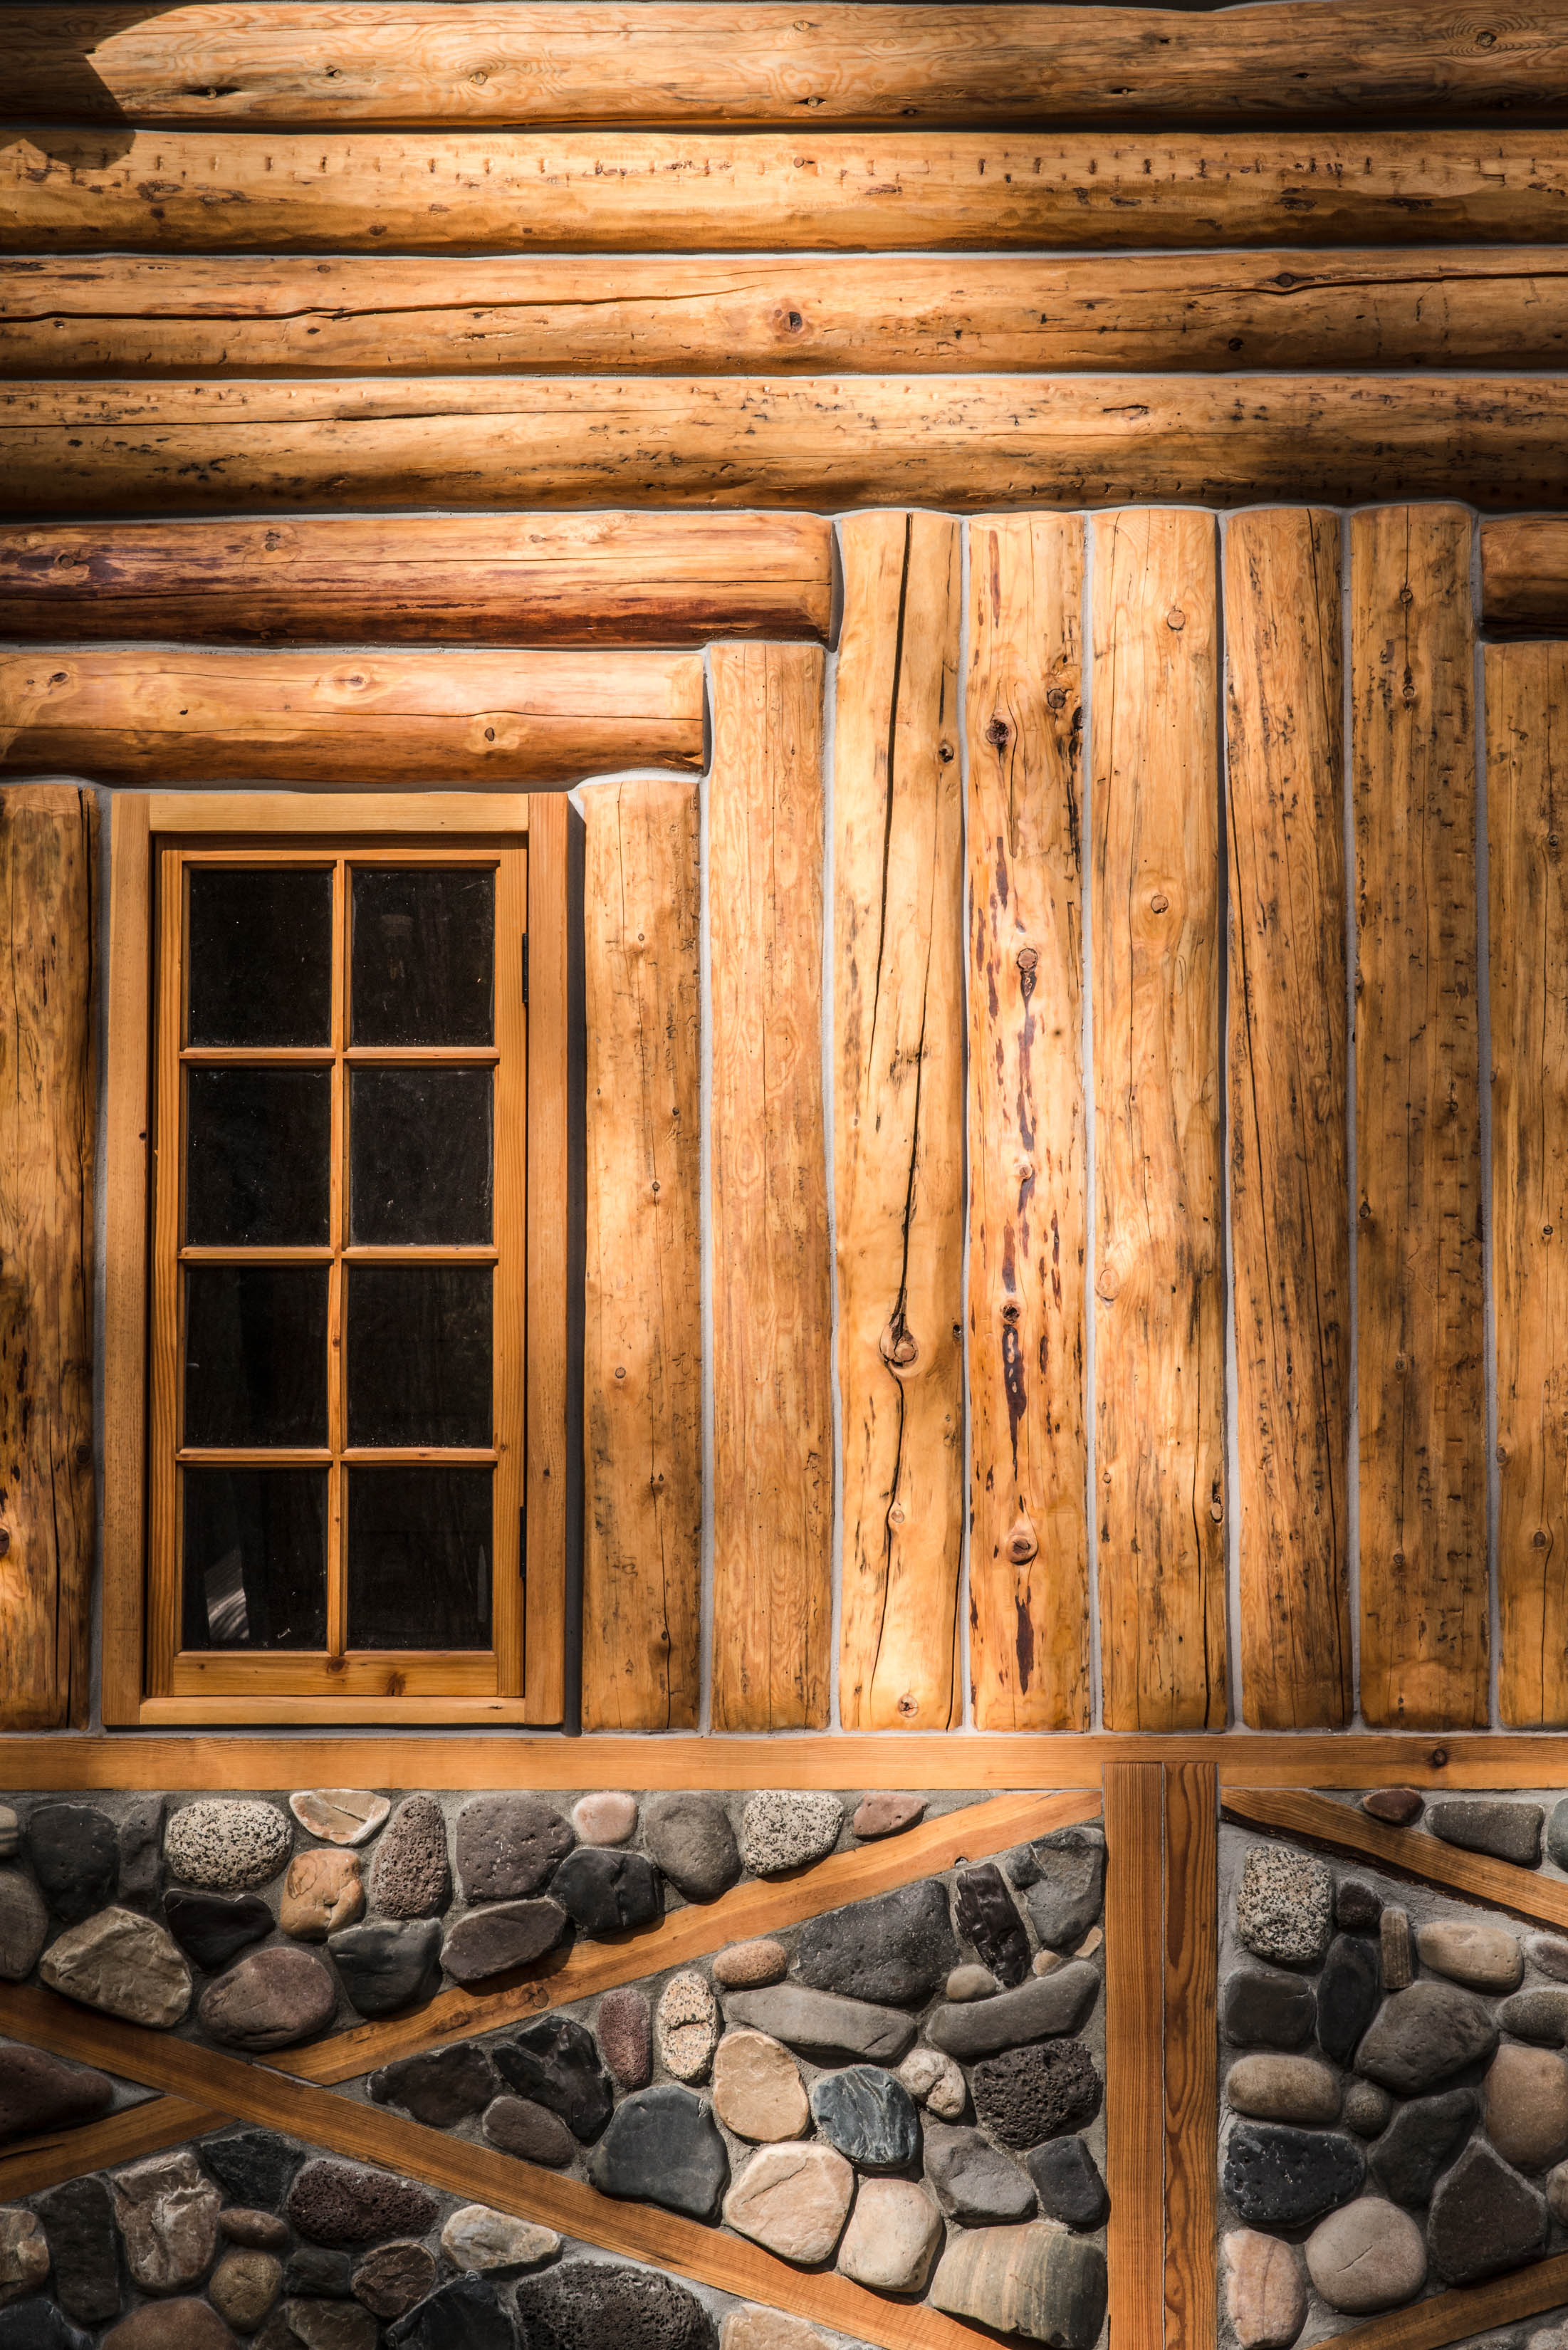 Minam_River_Lodge_Wallowa_Mountains_Eagle_Cap_Wilderness_Oregon_Autumn_2017_Please_Credit_Talia_Jean_Galvin-134.jpg